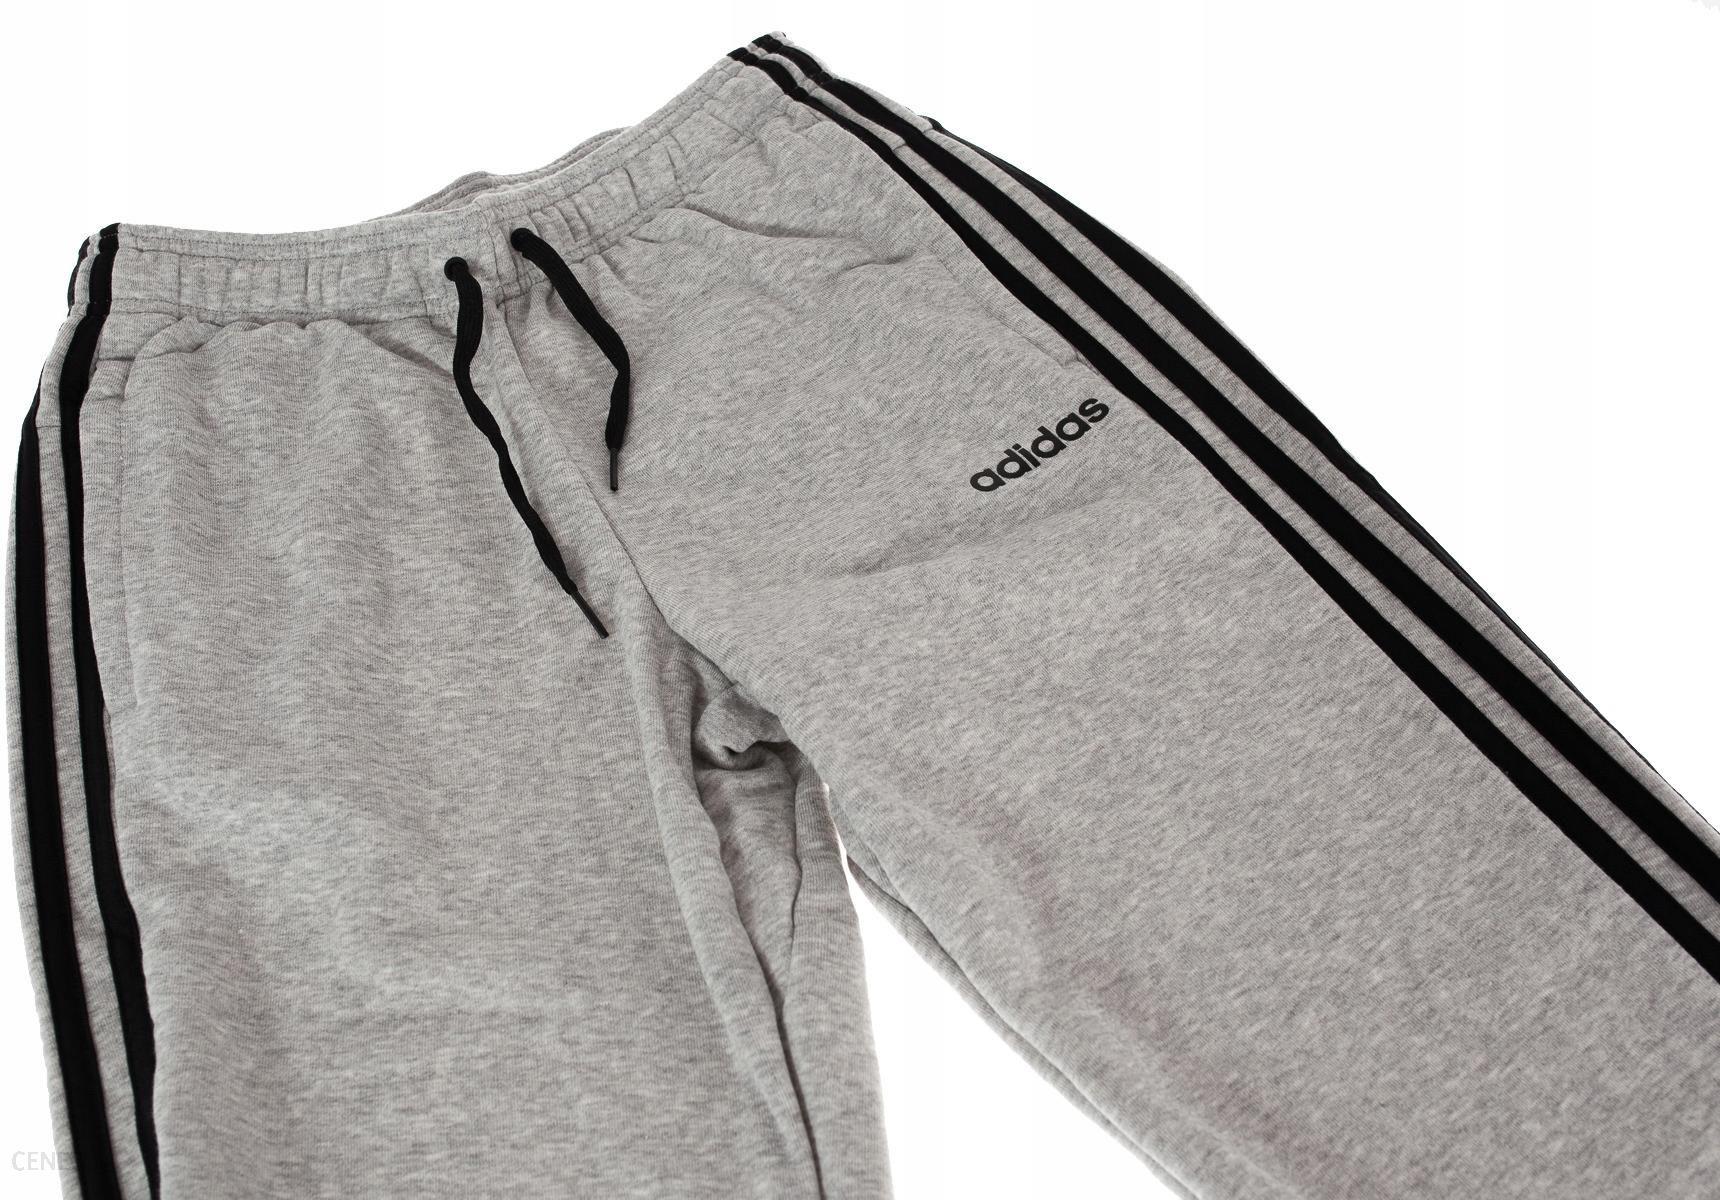 Spodnie Męskie Adidas Essentials 3 Stripes DQ3077